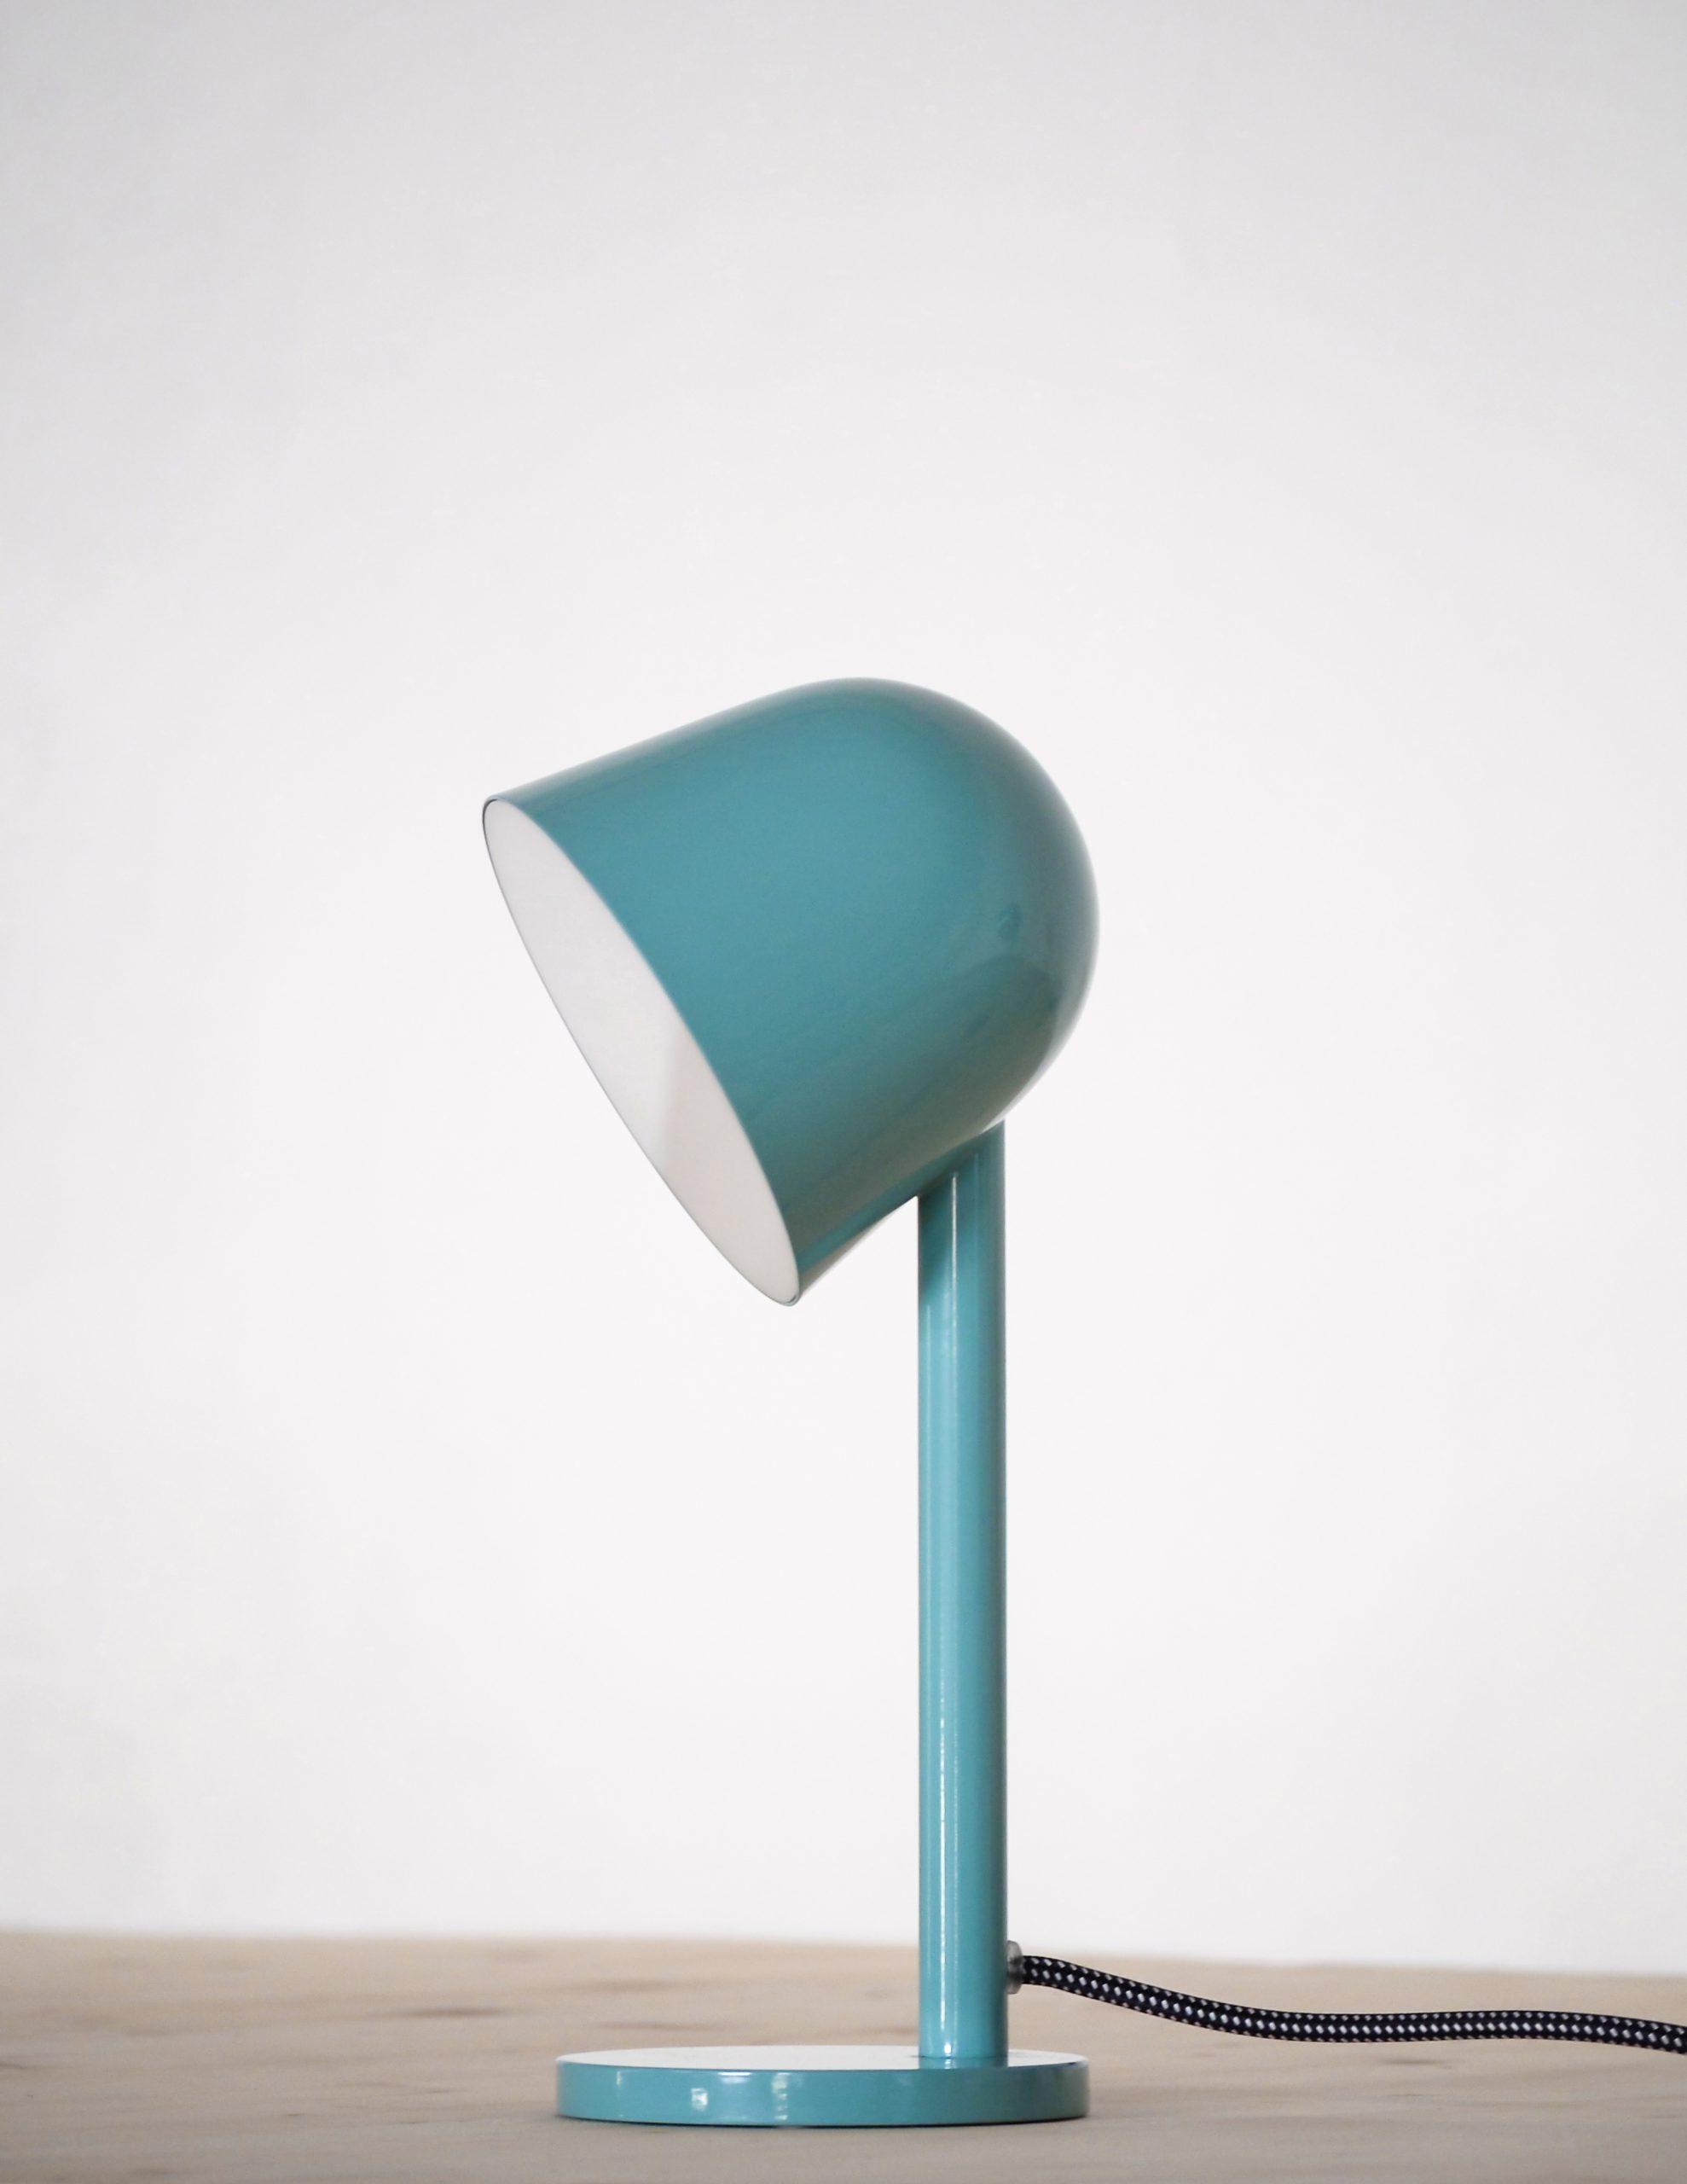 Sky blue Campanule lamp by Debiasi sandri for Ligne Roset